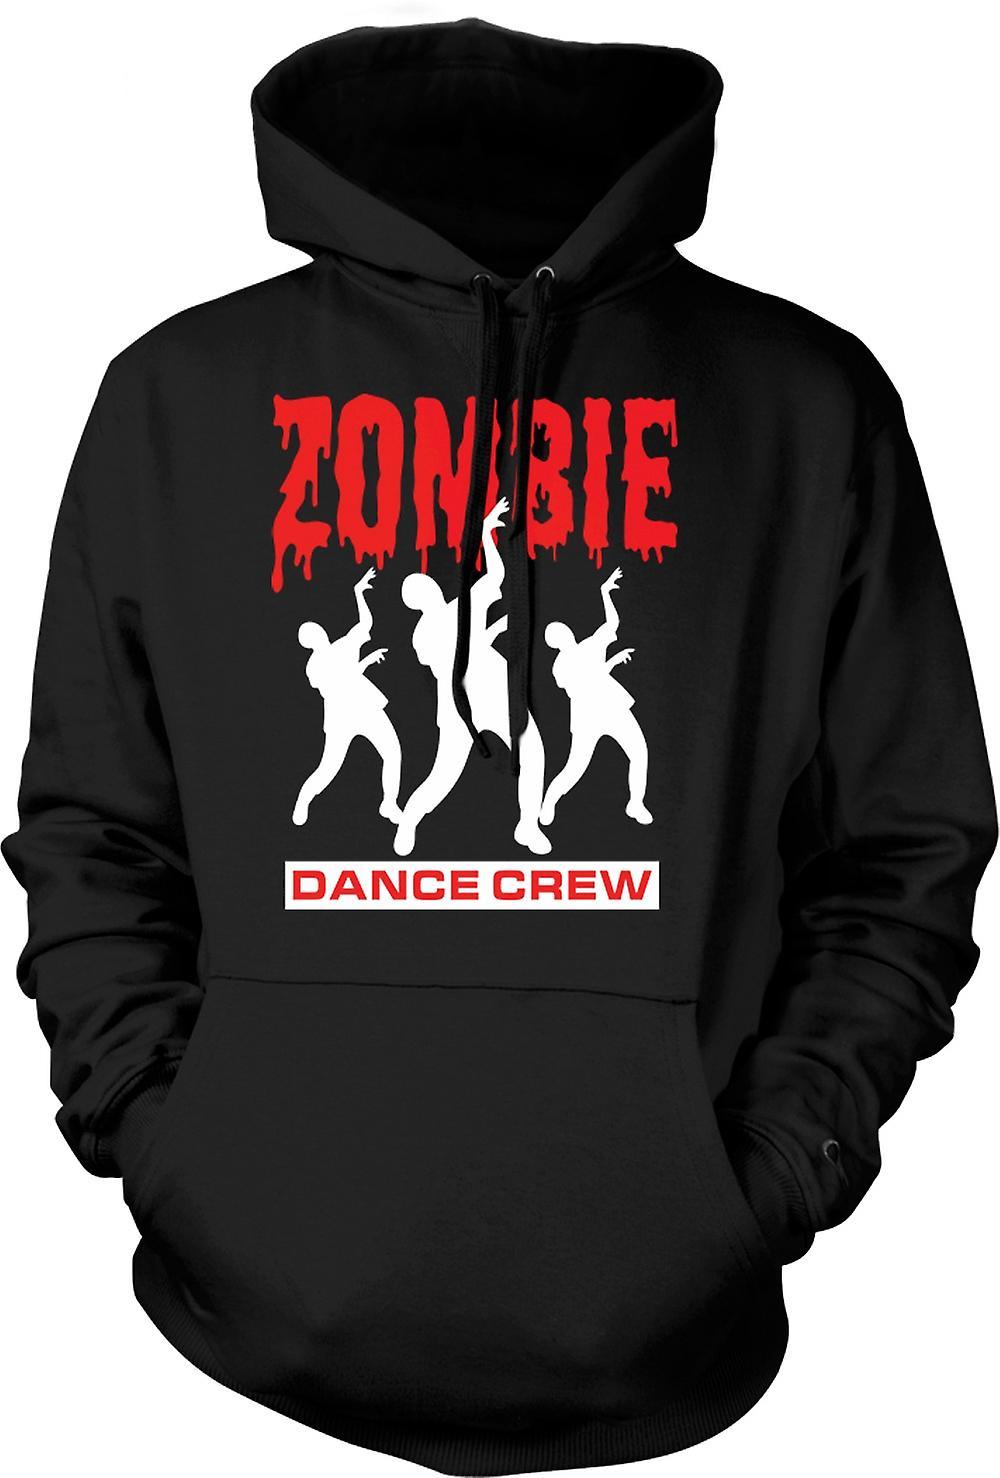 Kids Hoodie - Zombie Dance Crew - Funny Horror